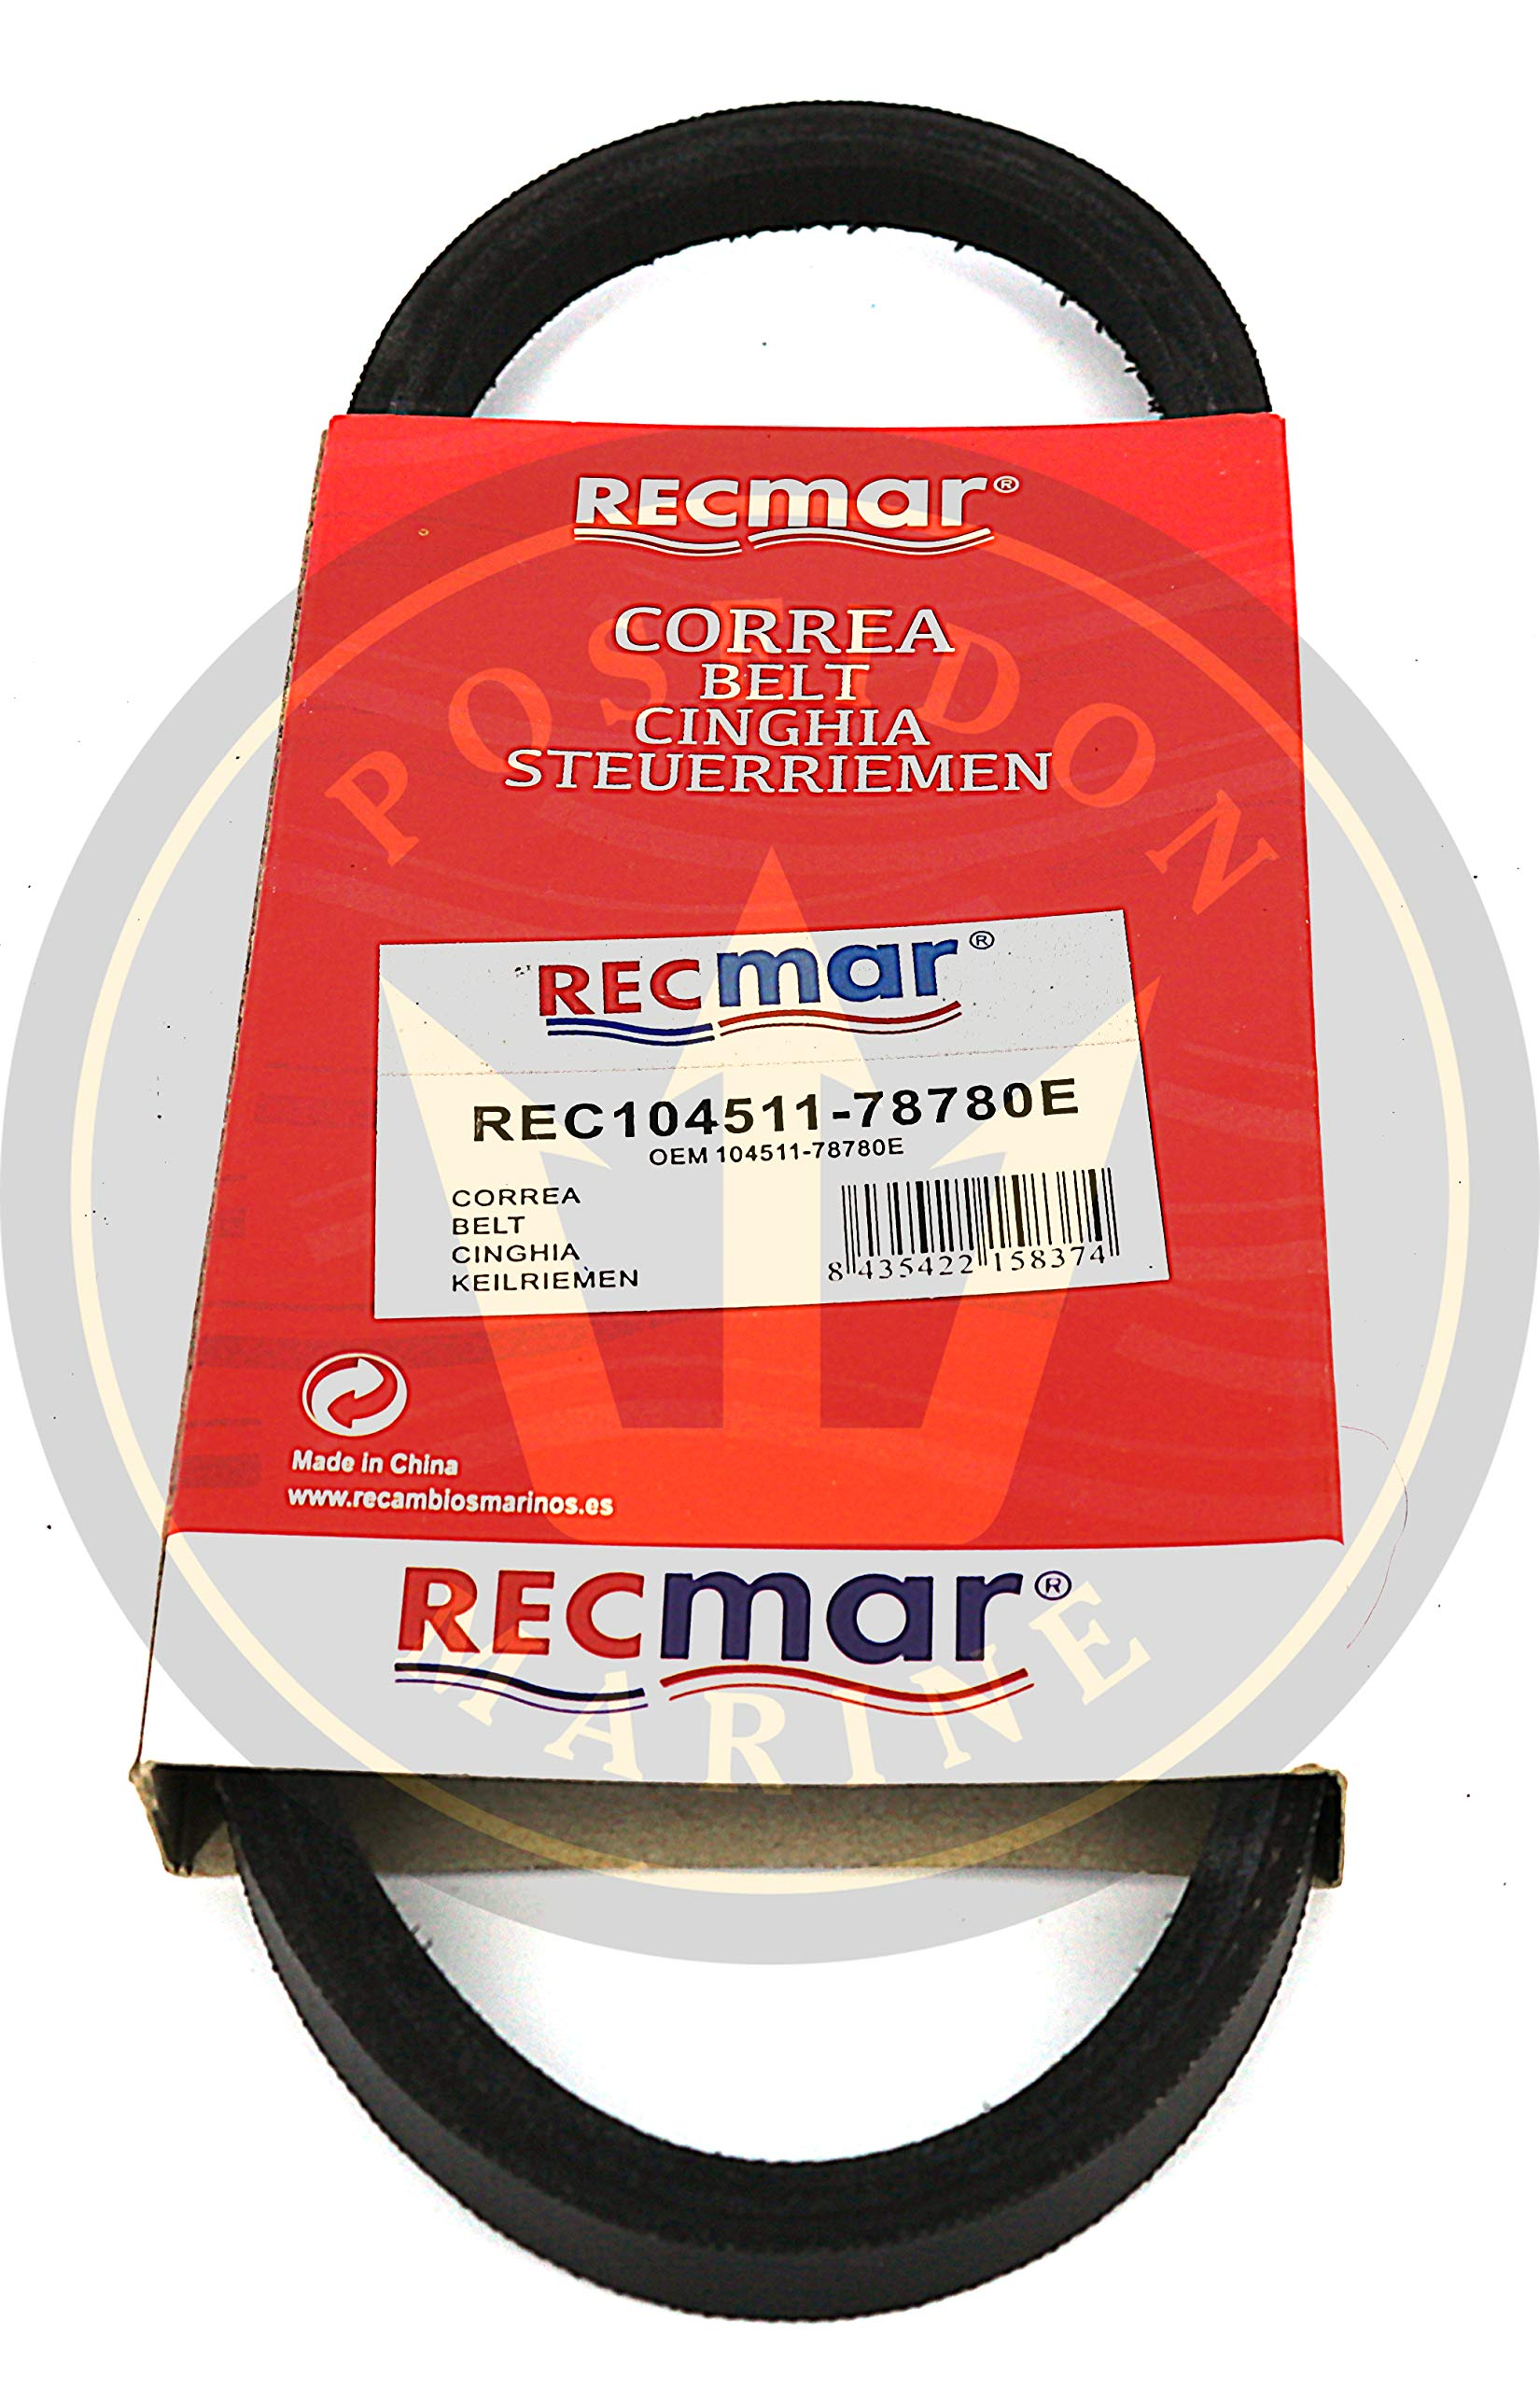 114250-12581 L60 Hippotech Air Filter Combo Yanmar L40 L48 L70 Replaces 114250-12580